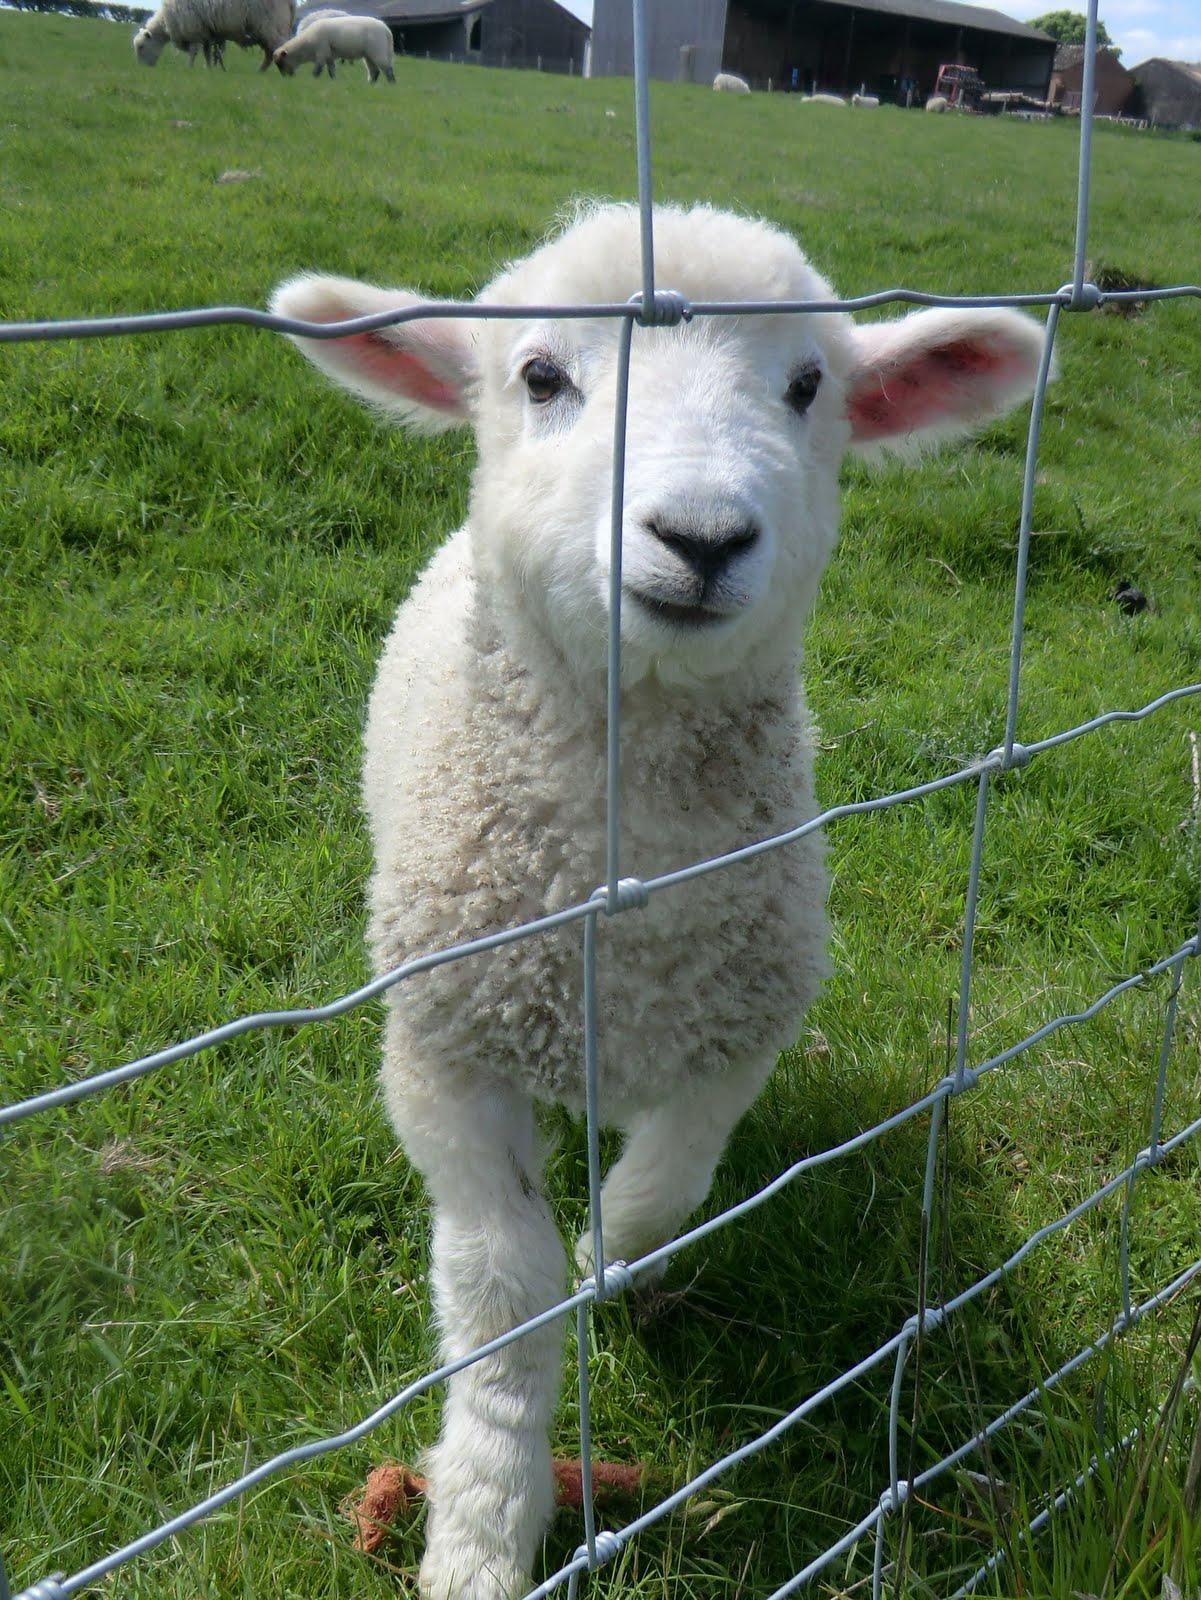 CIMG8148 Inquisitive lamb at Botley Hill Farm